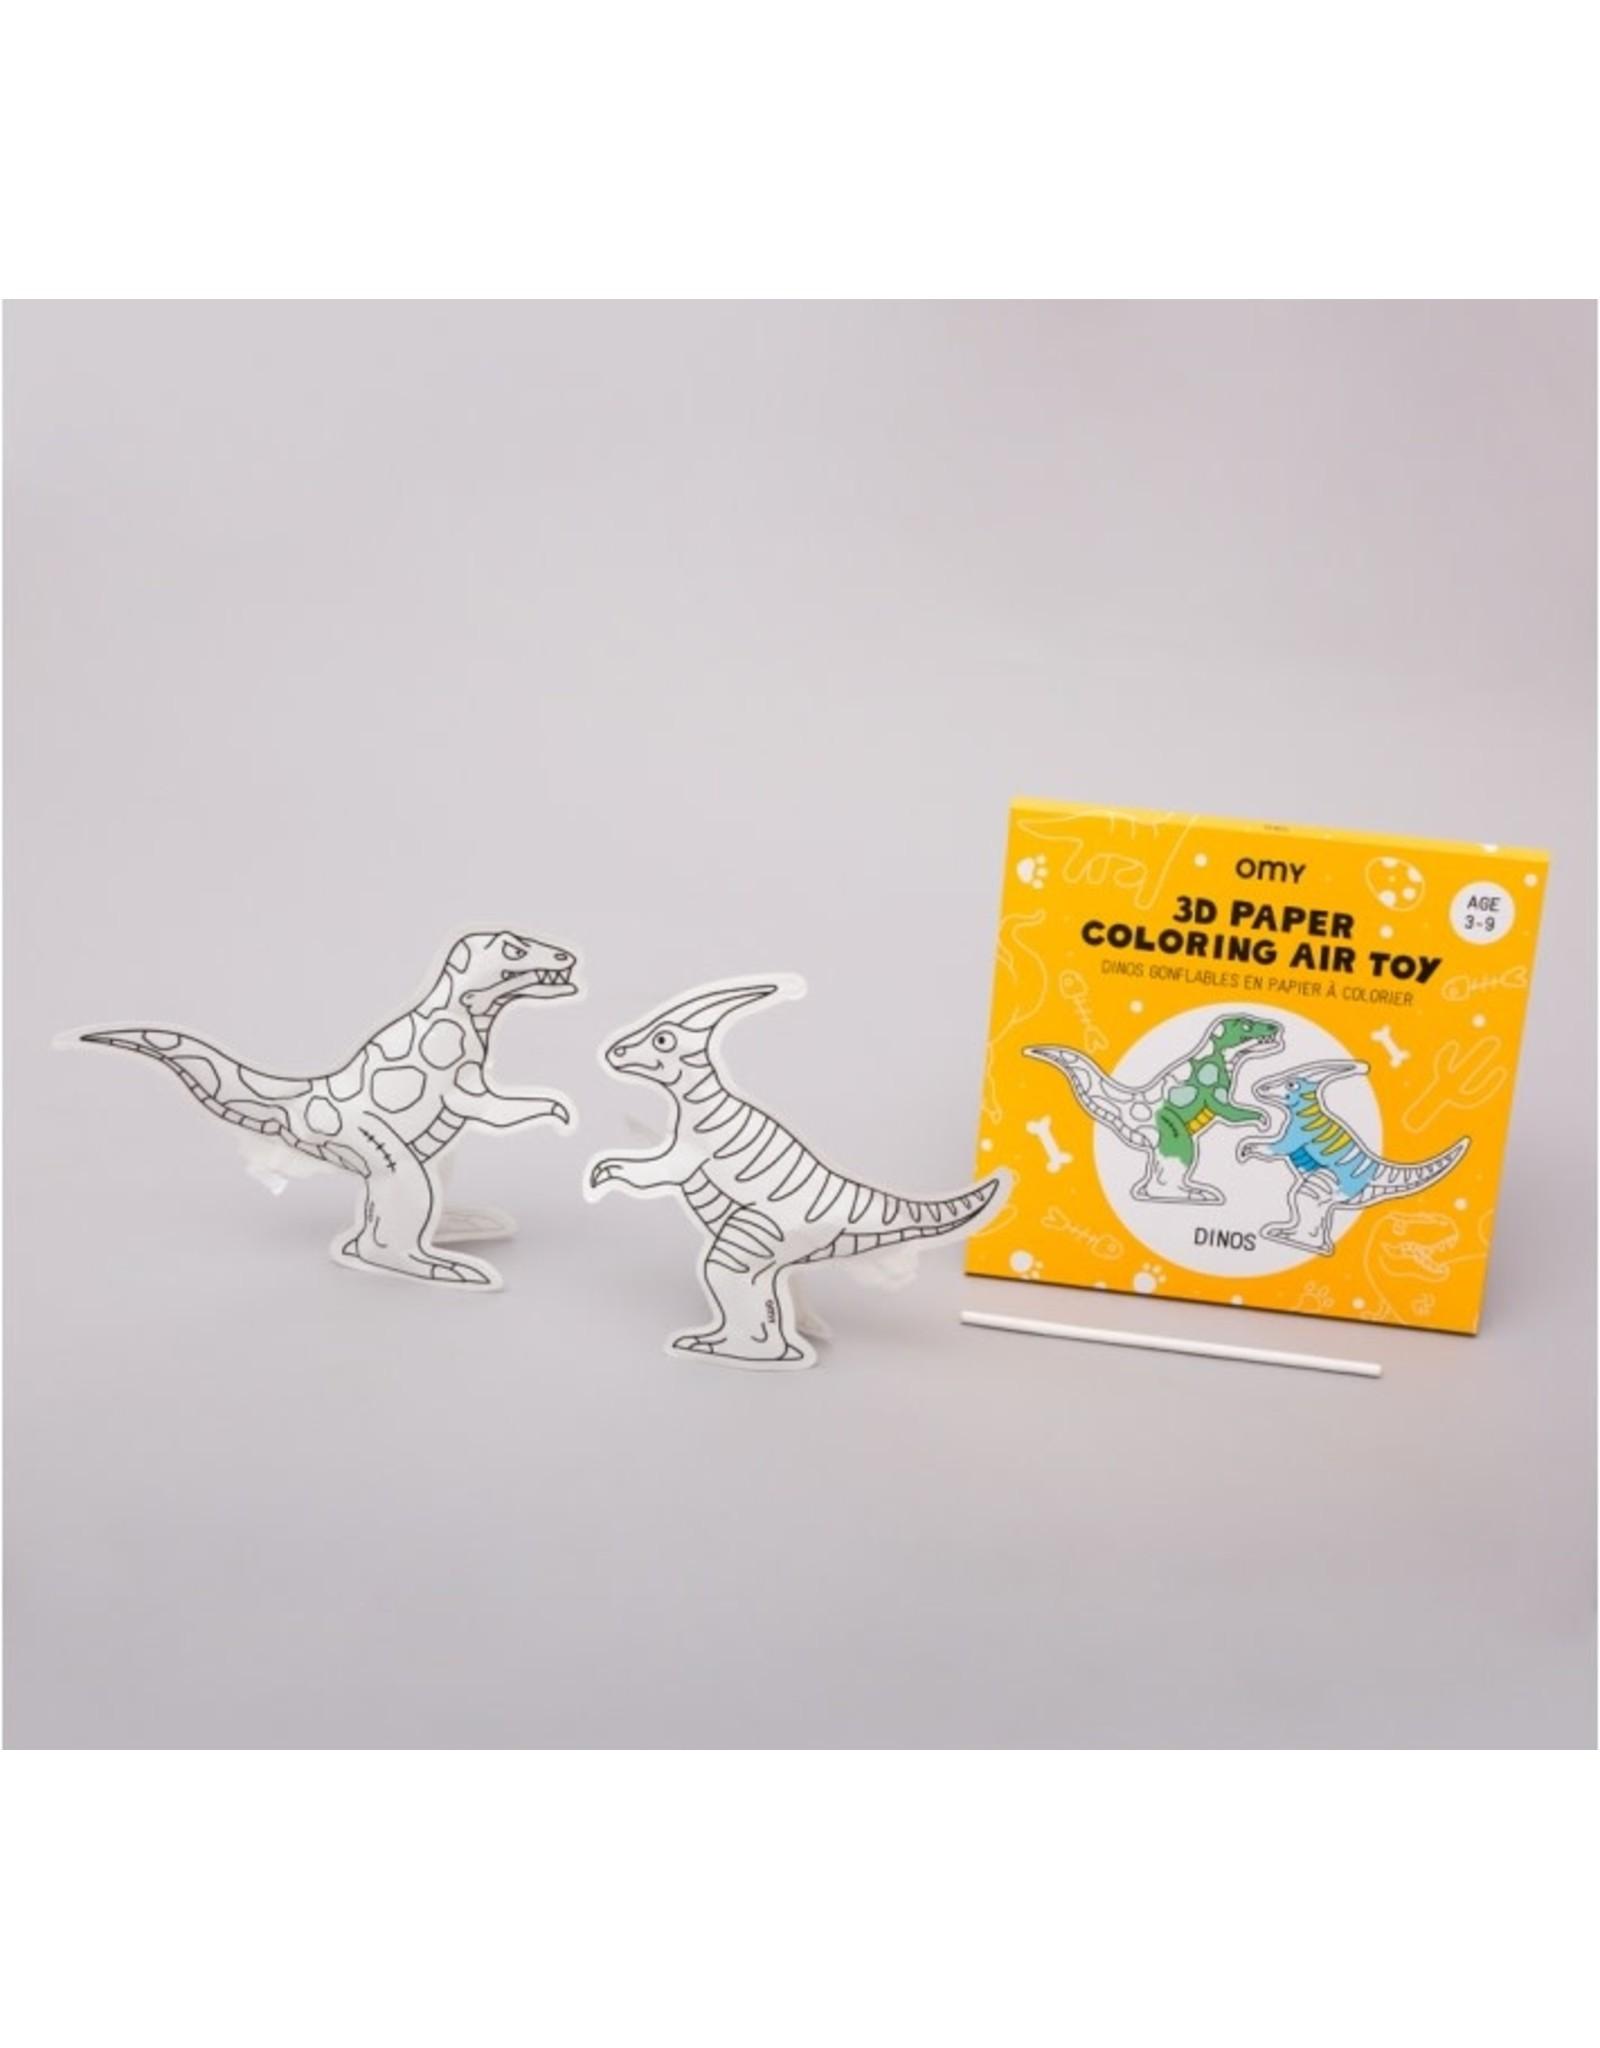 OMY Dinos- 3D Air Toy